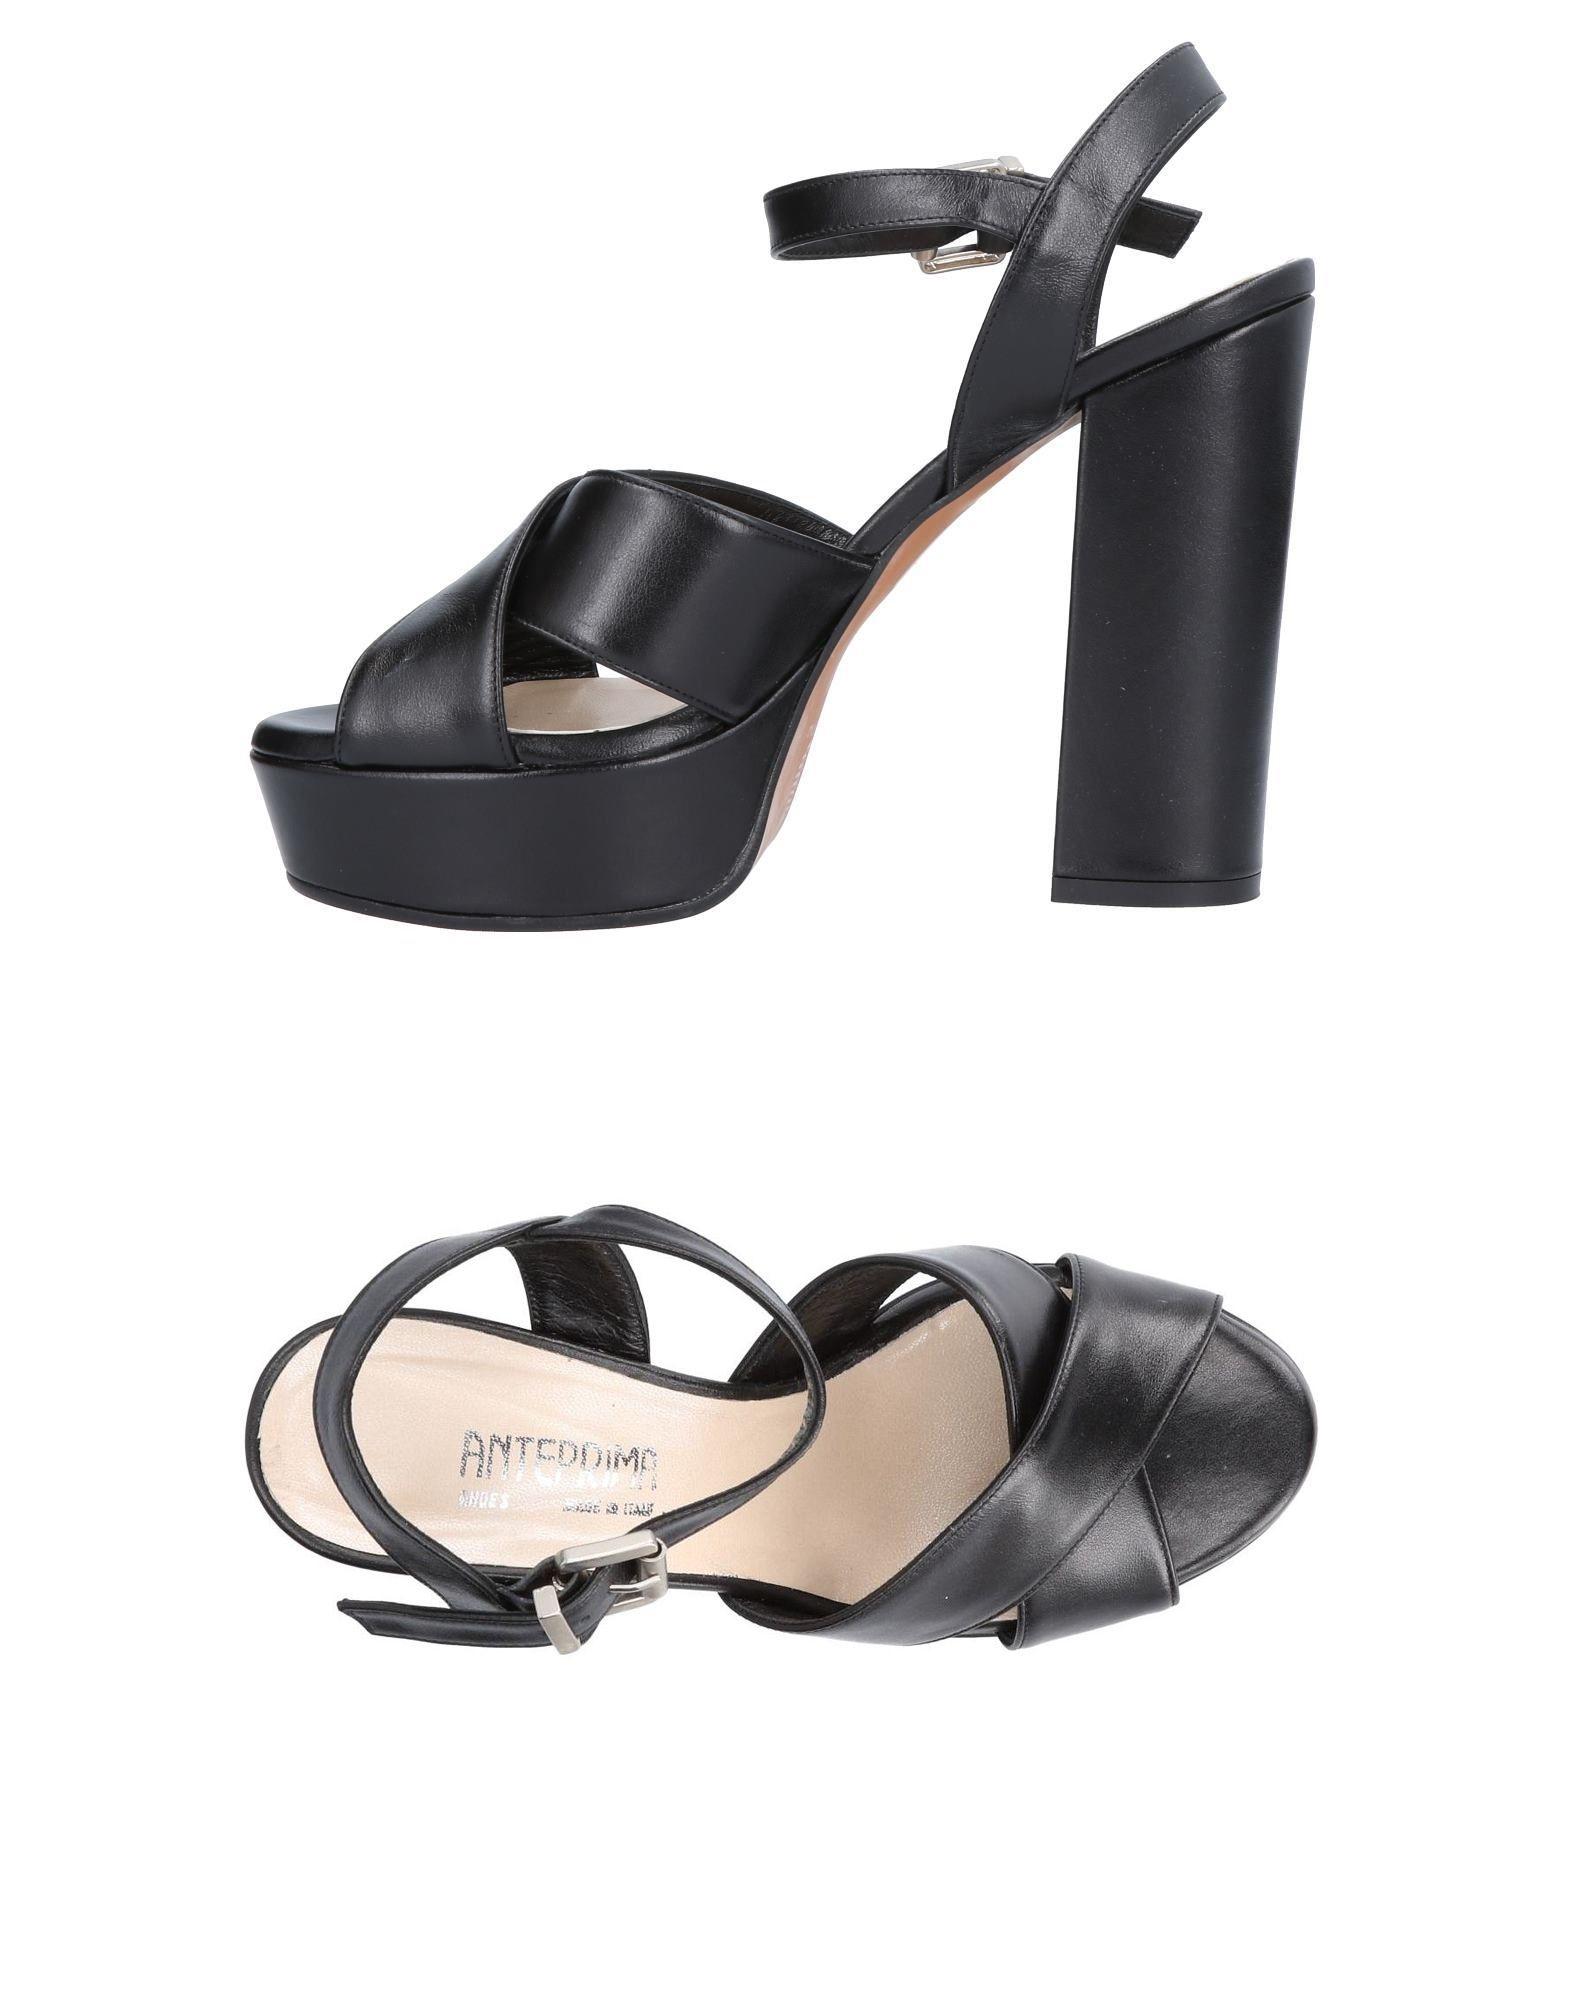 Anteprima Sandals - Women Anteprima Sandals Kingdom online on  United Kingdom Sandals - 11471253FJ 624a05